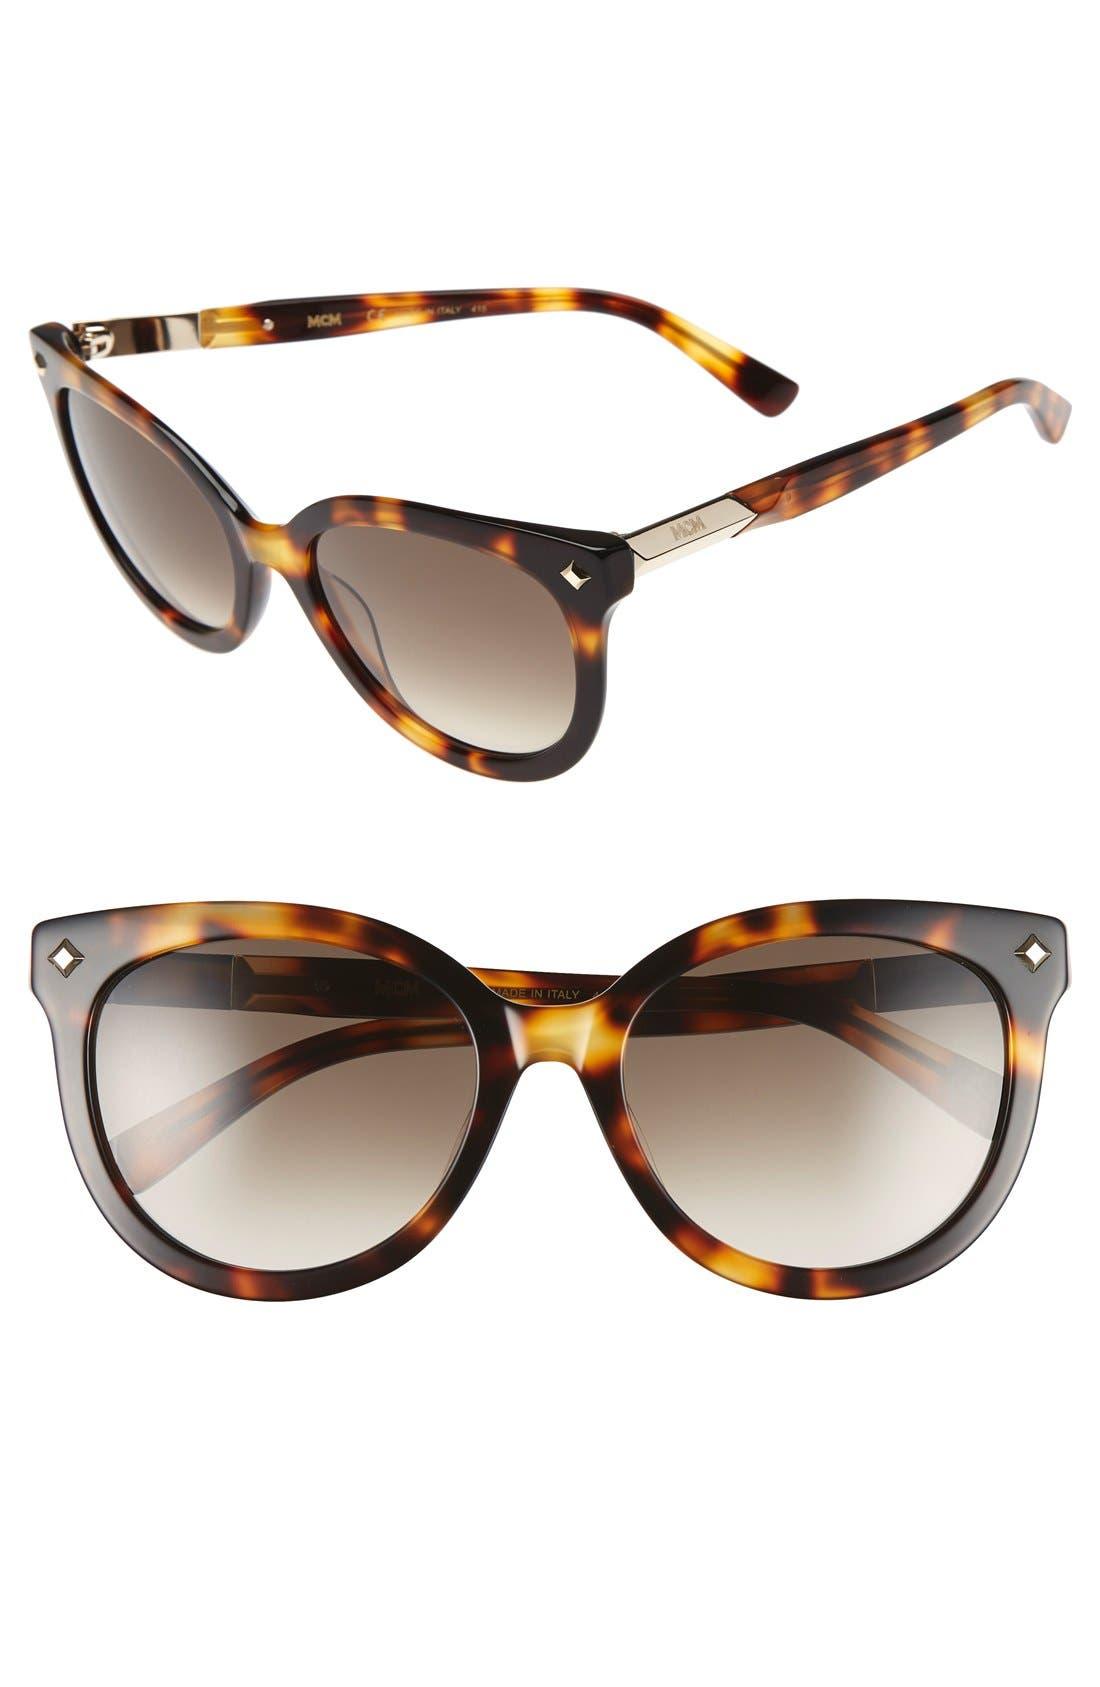 Alternate Image 1 Selected - MCM 56mm Retro Sunglasses